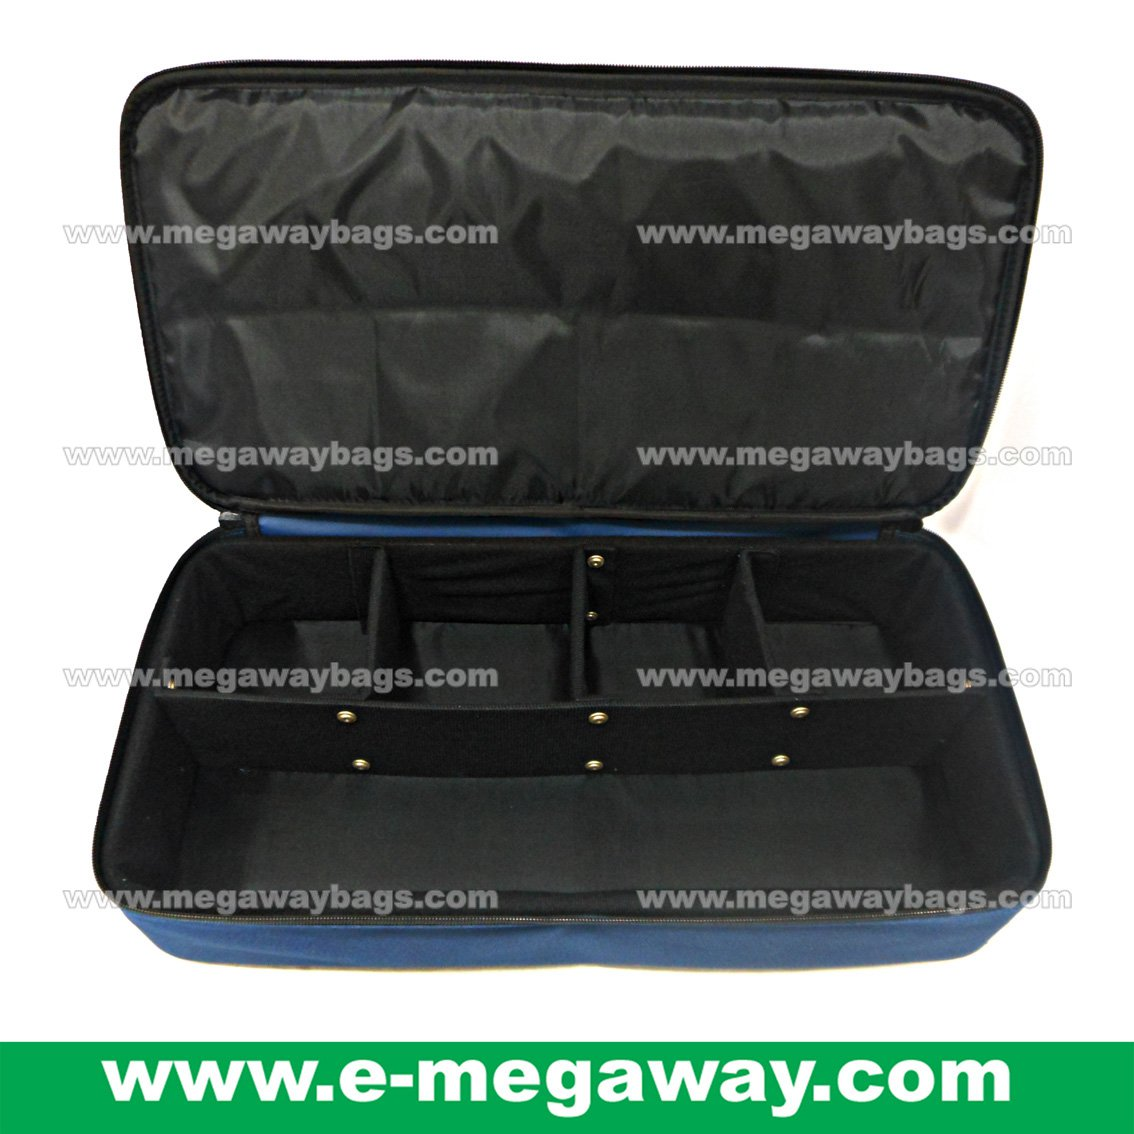 Takeaway (Zip-Up-Go) Tools Hard Boxes Bag Organizers Desktop Craft MegawayBags #CC-0998